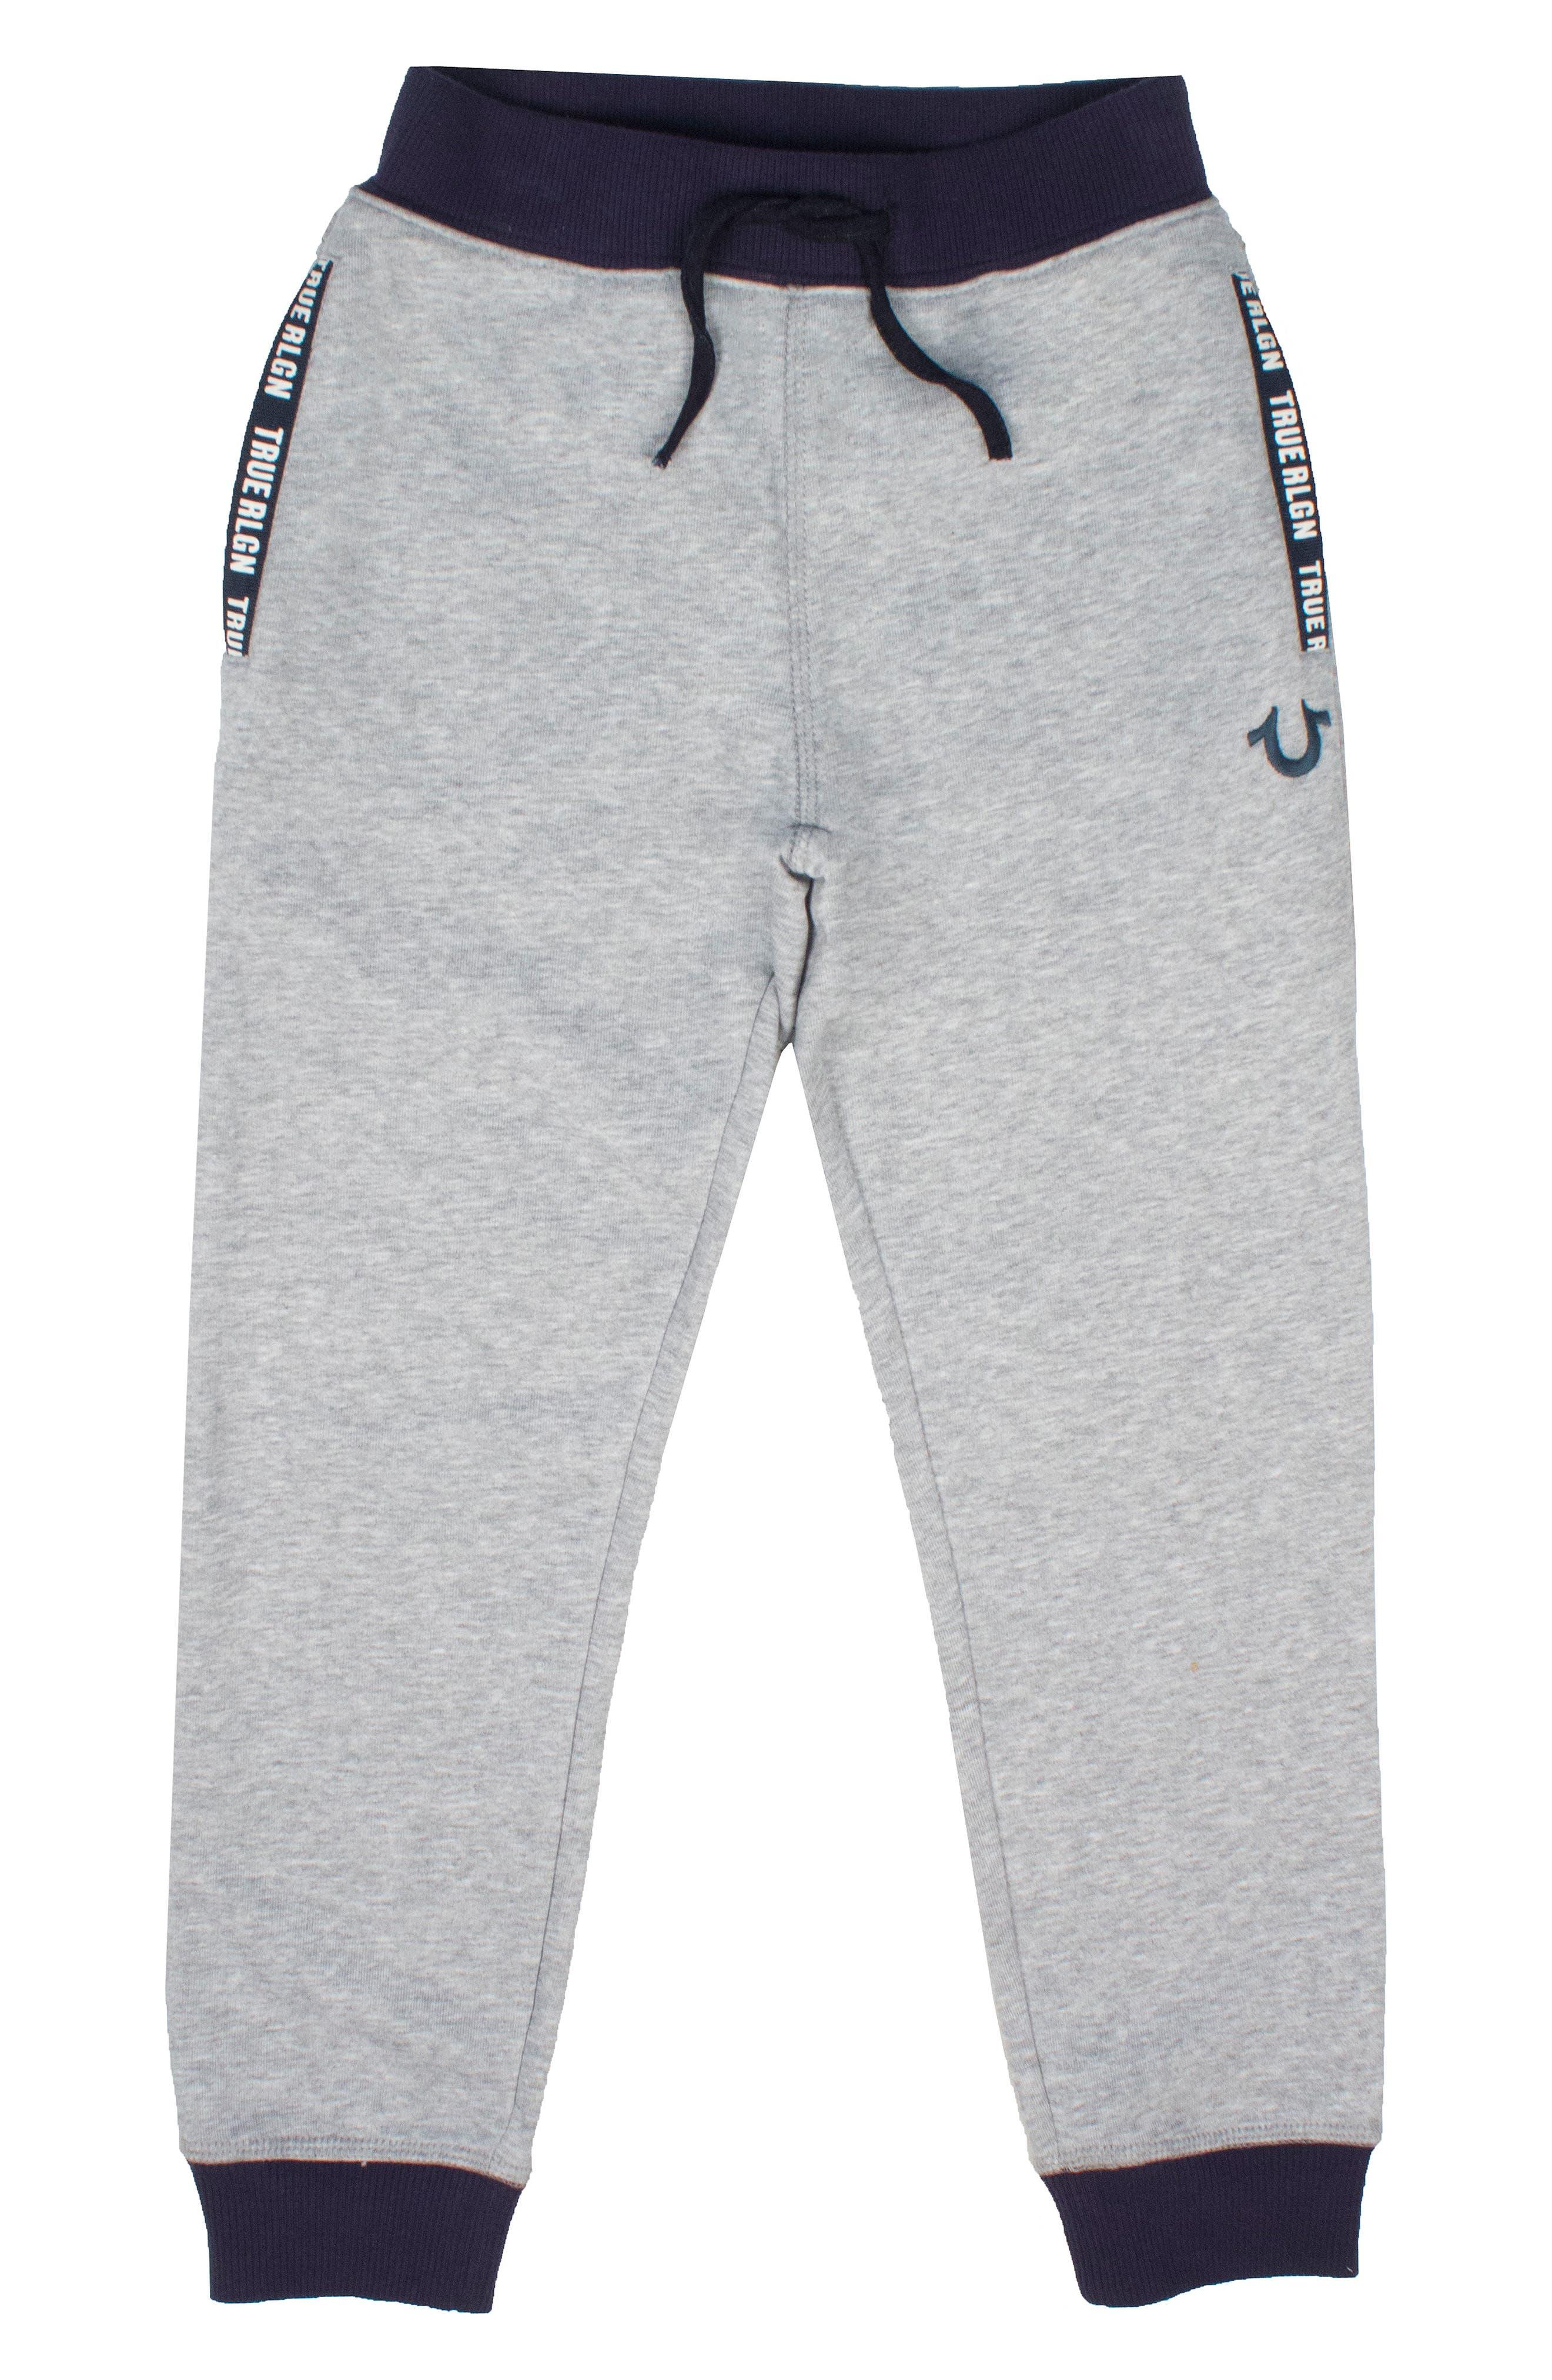 Main Image - True Religion Brand Jeans Tape Sweatpants (Big Boys)